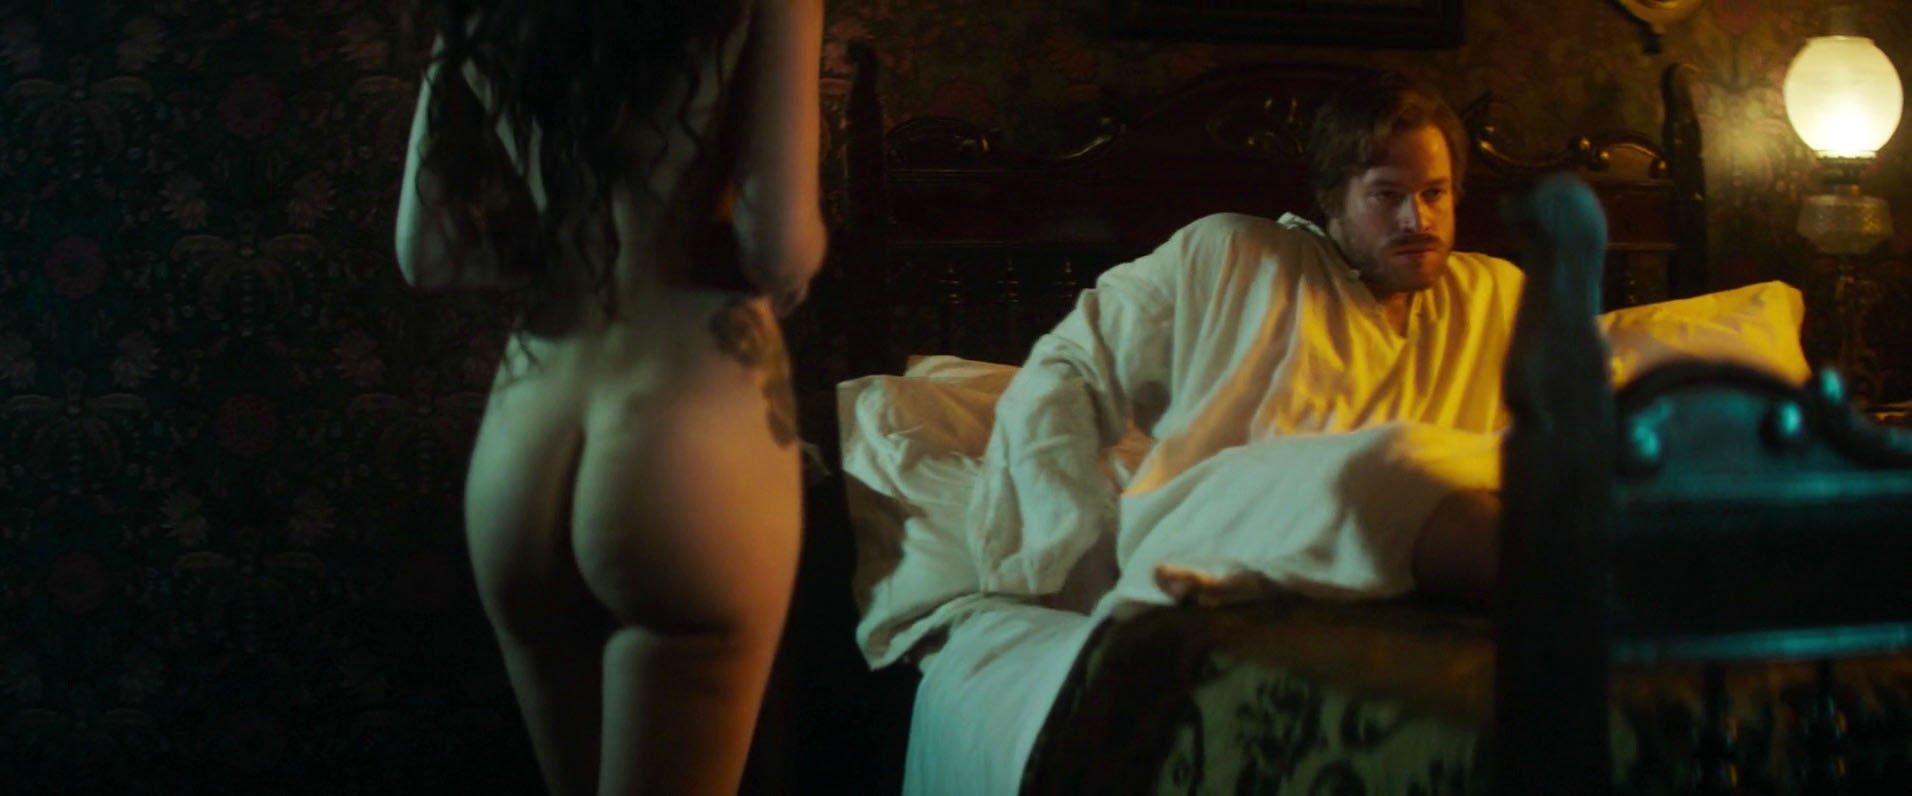 Randi wright sex tape